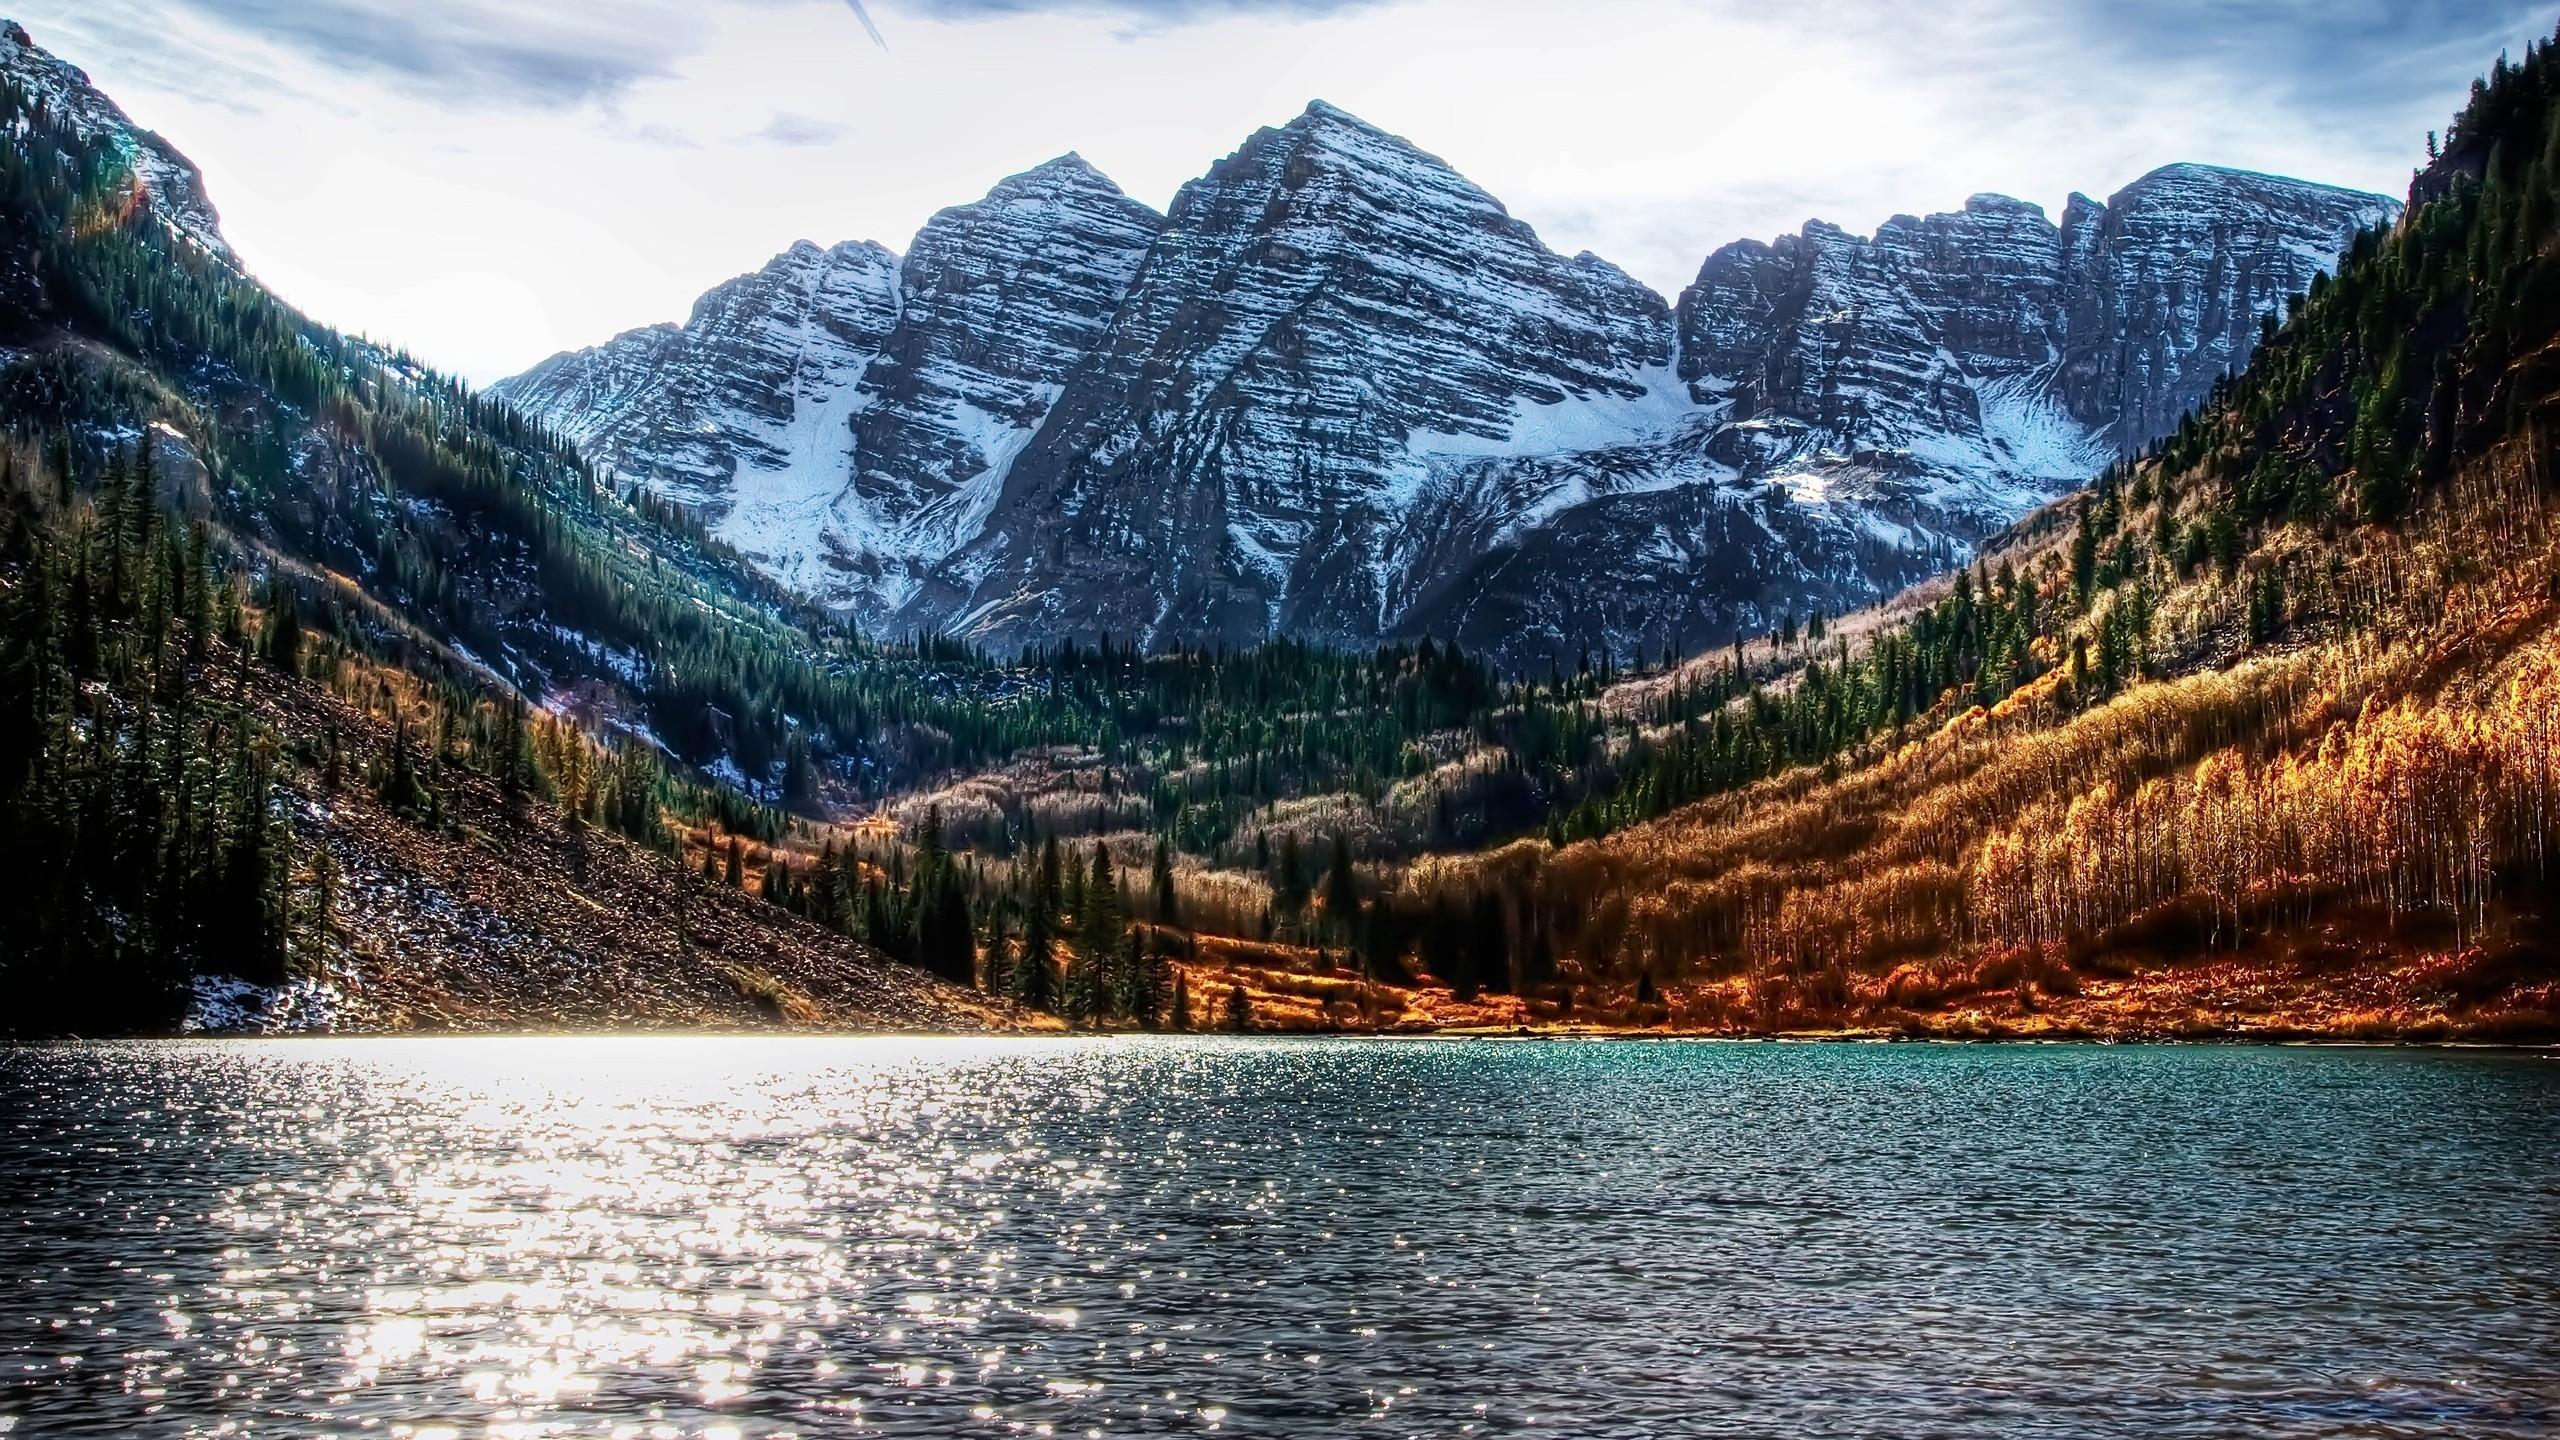 File Name: colorado-scenery-wallpaper-wallpaper-4.jpg. Text: Colorado  Mountain Lake. Cool Mount Everest HD Wallpaper